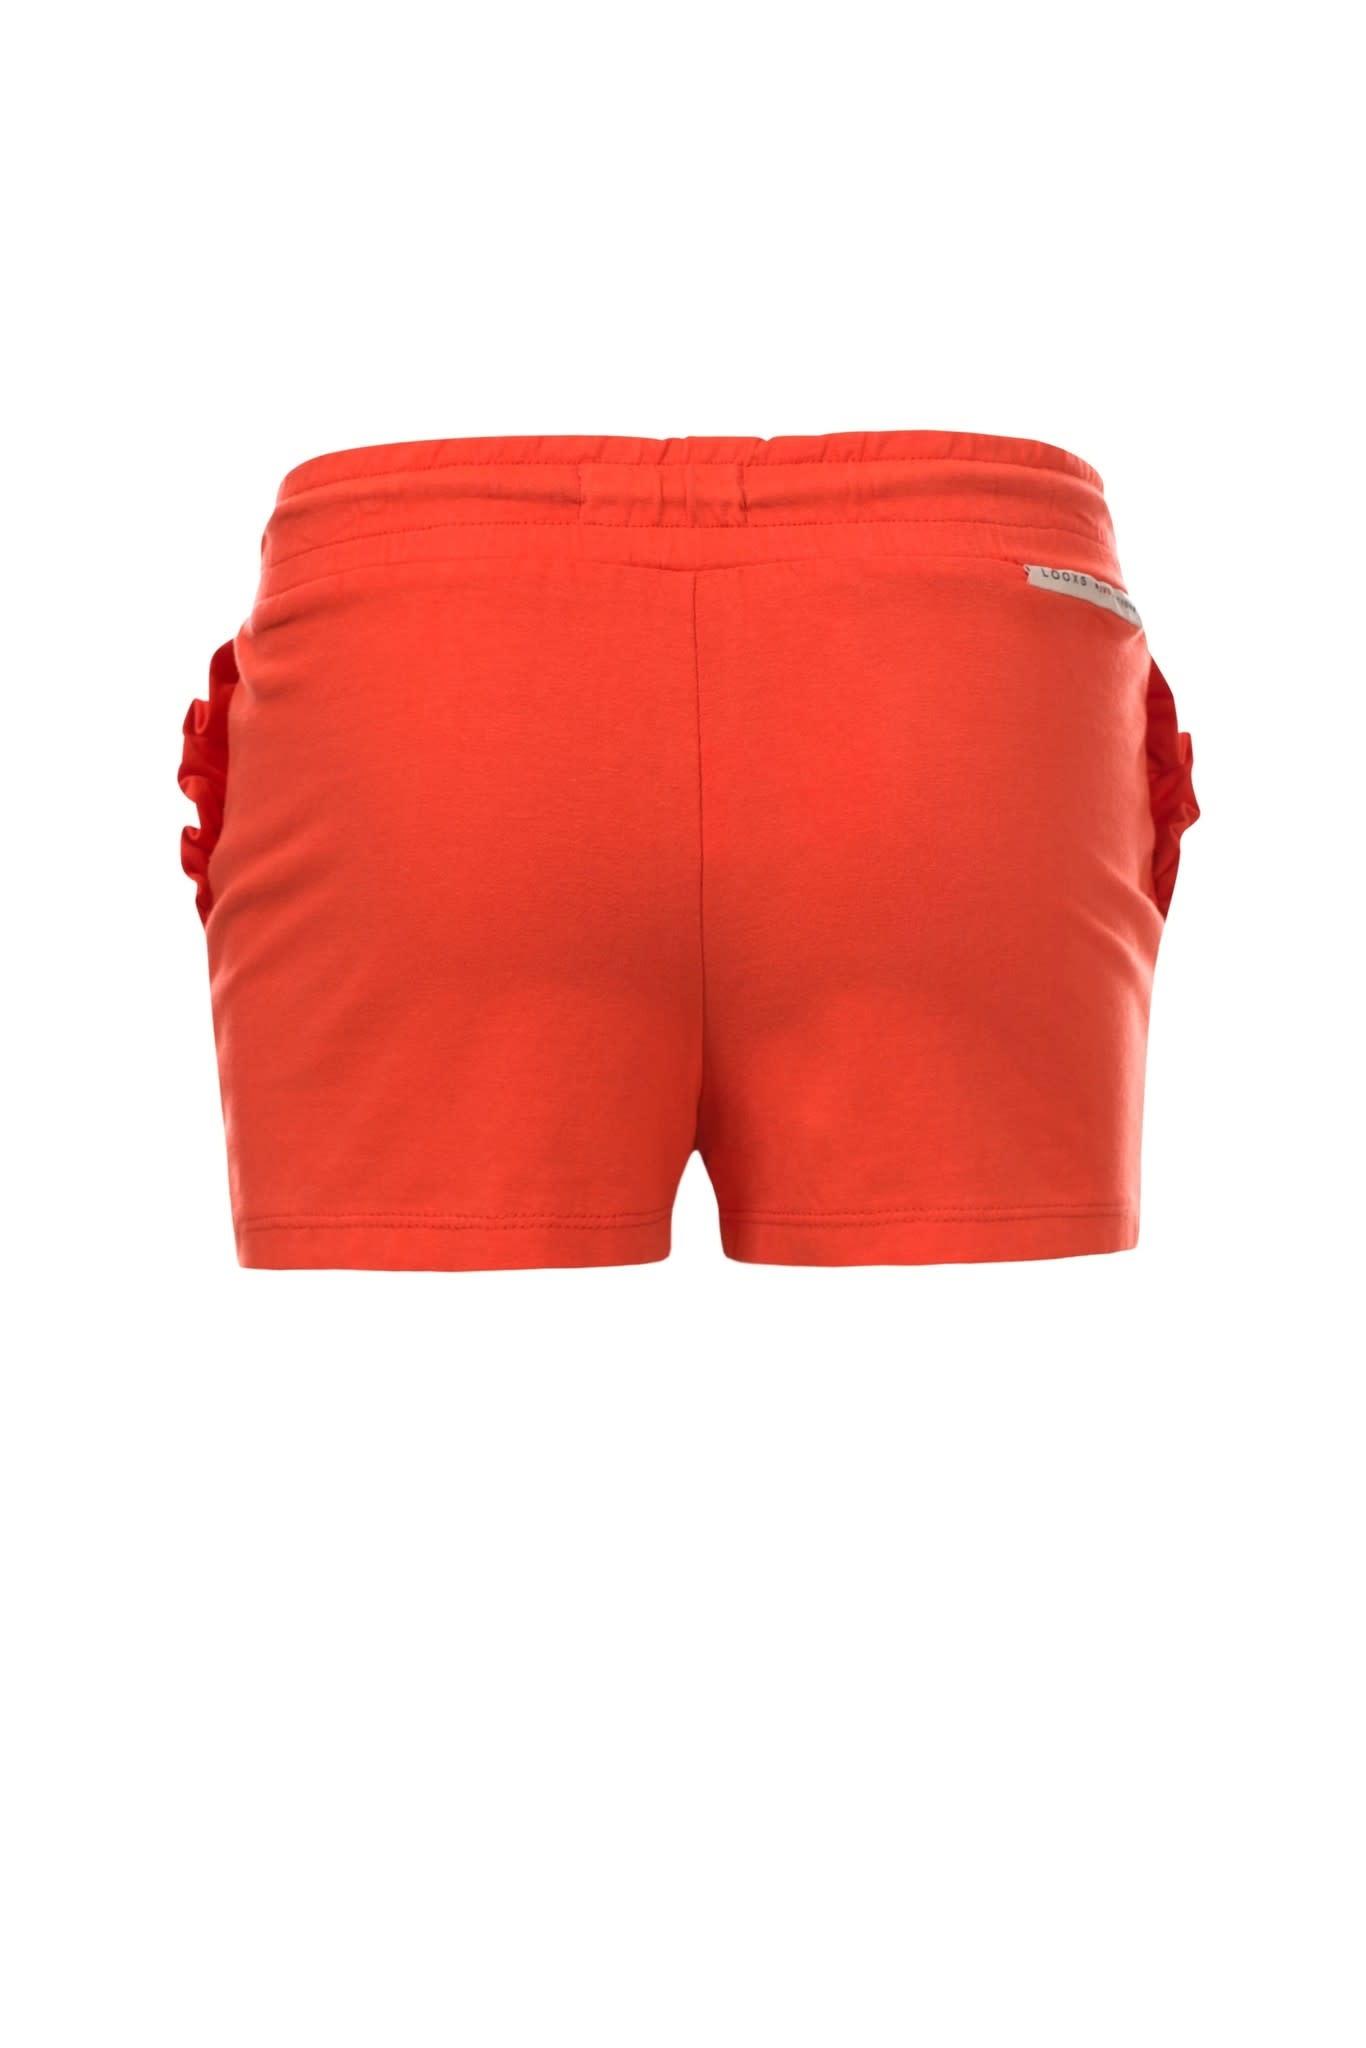 Looxs Sweat Short